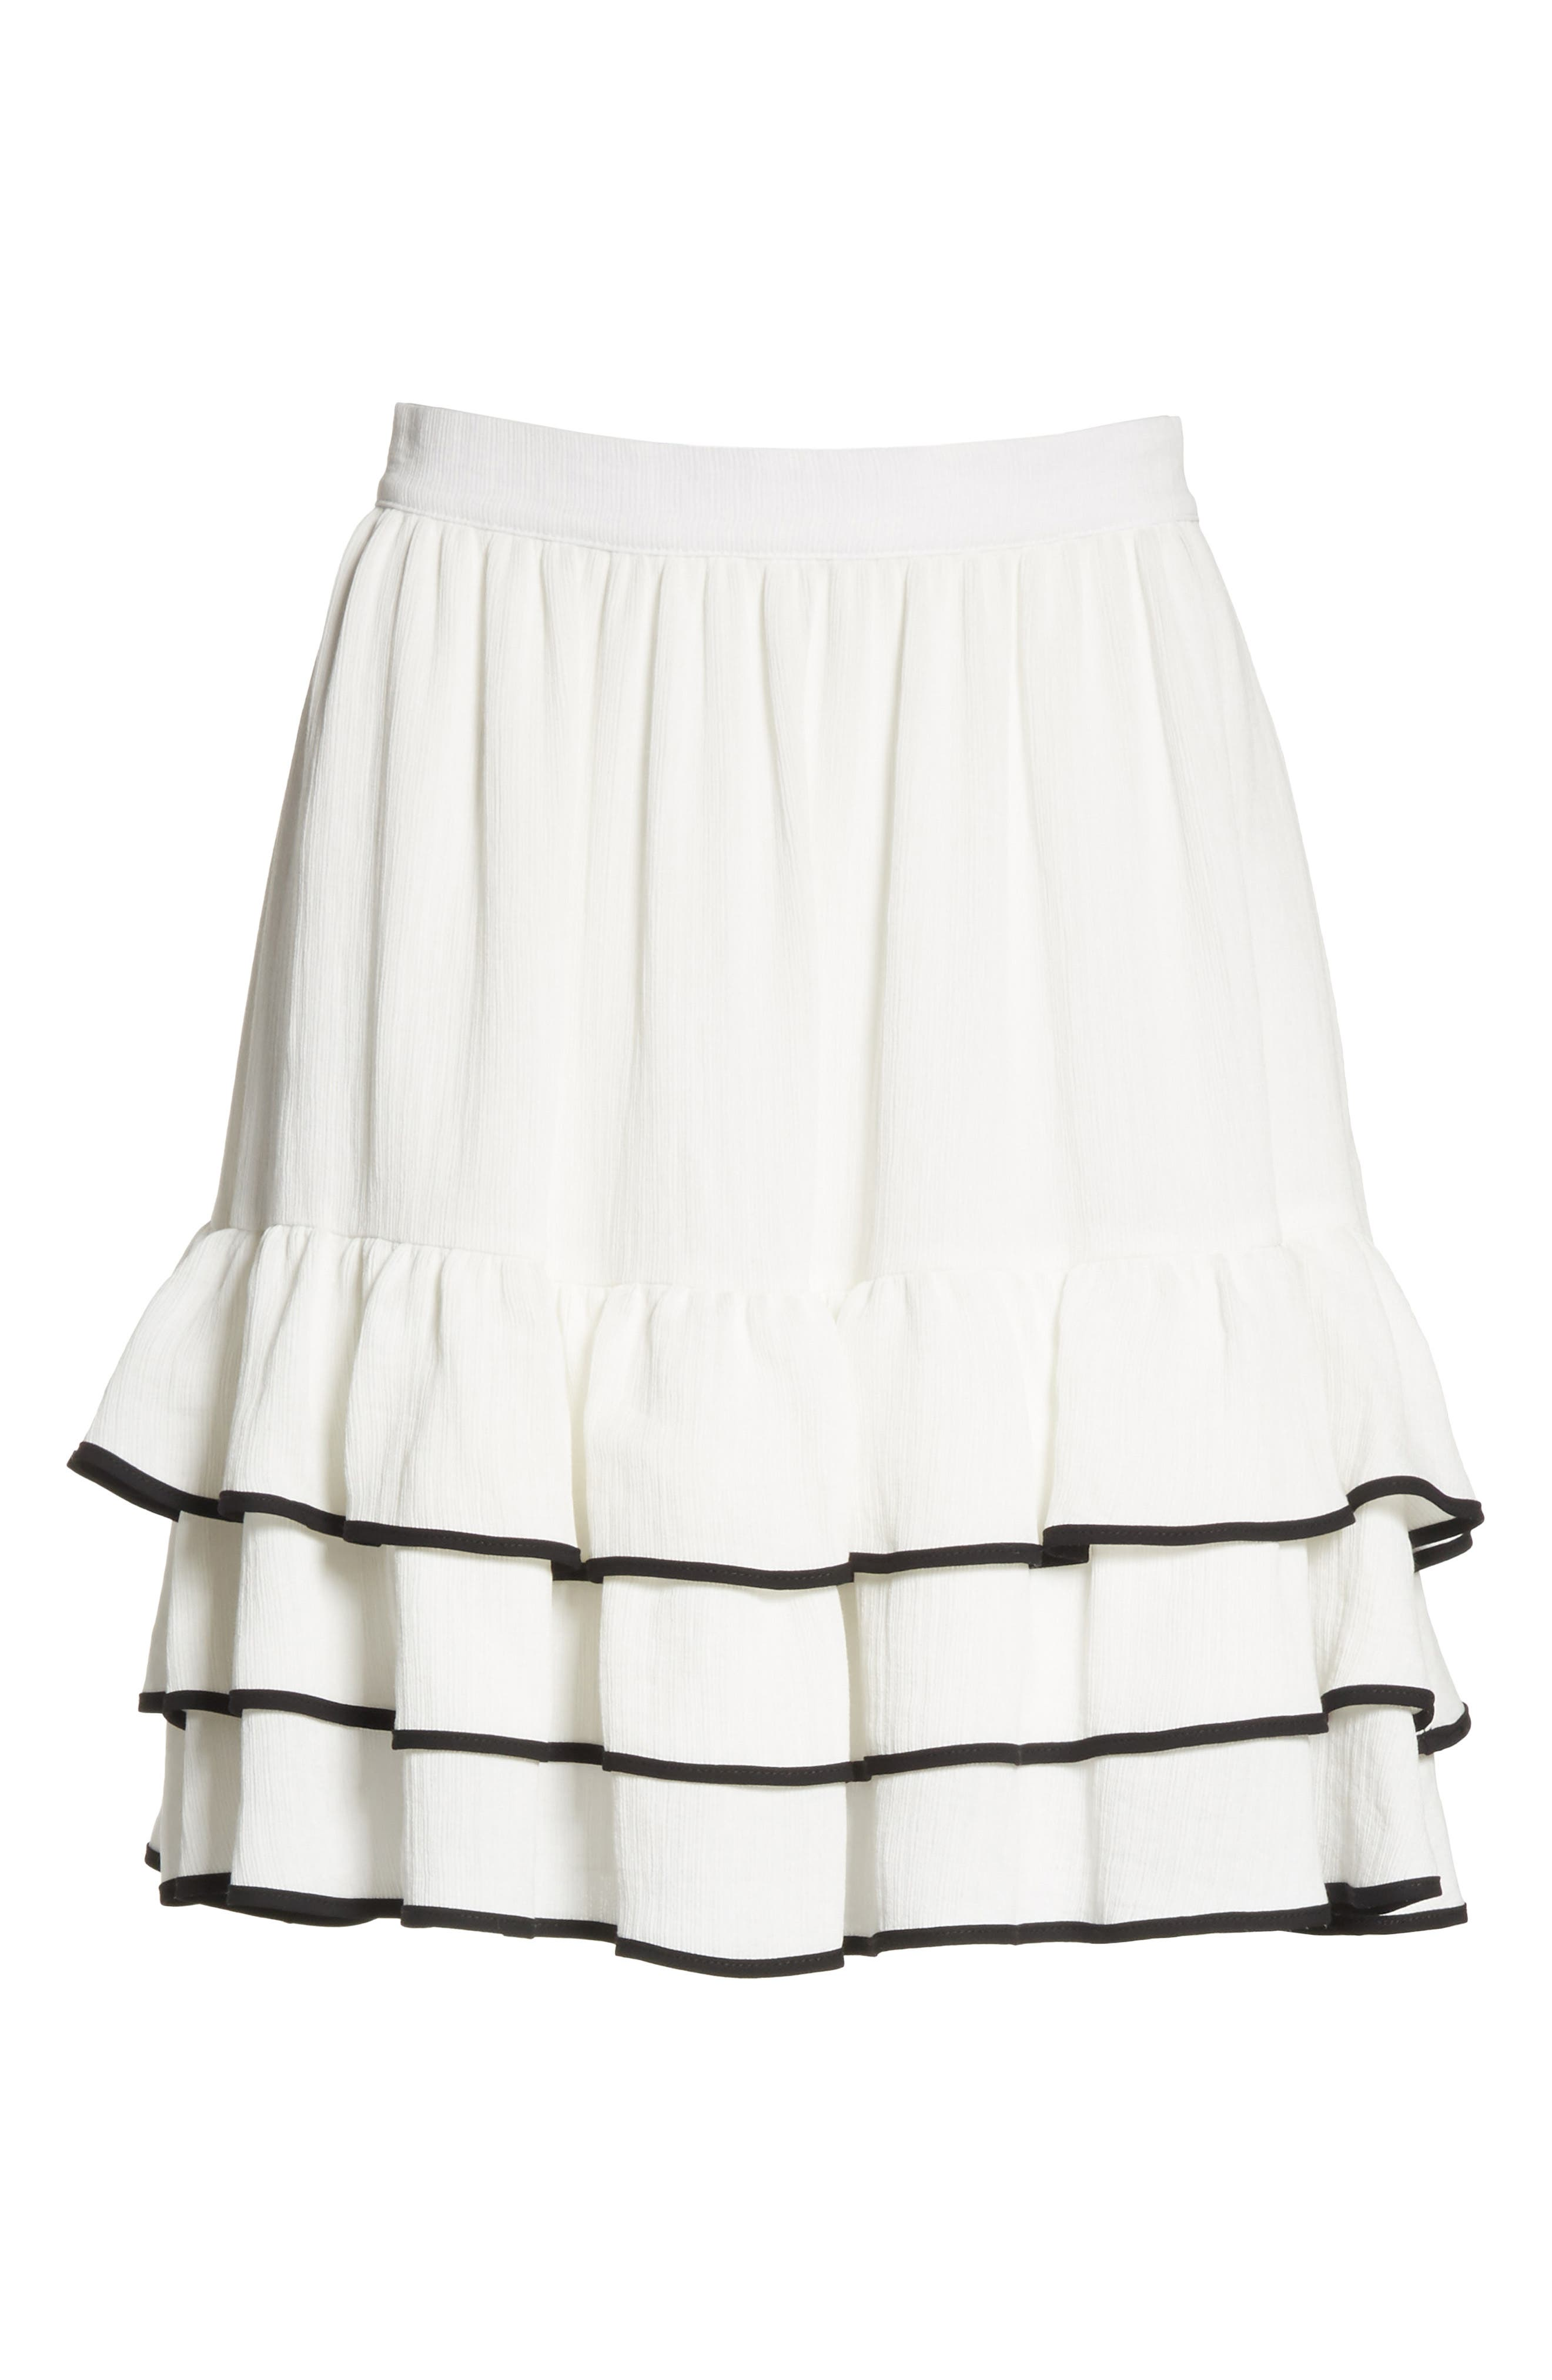 Prose & Poetry Carice Ruffle Miniskirt,                             Alternate thumbnail 6, color,                             101